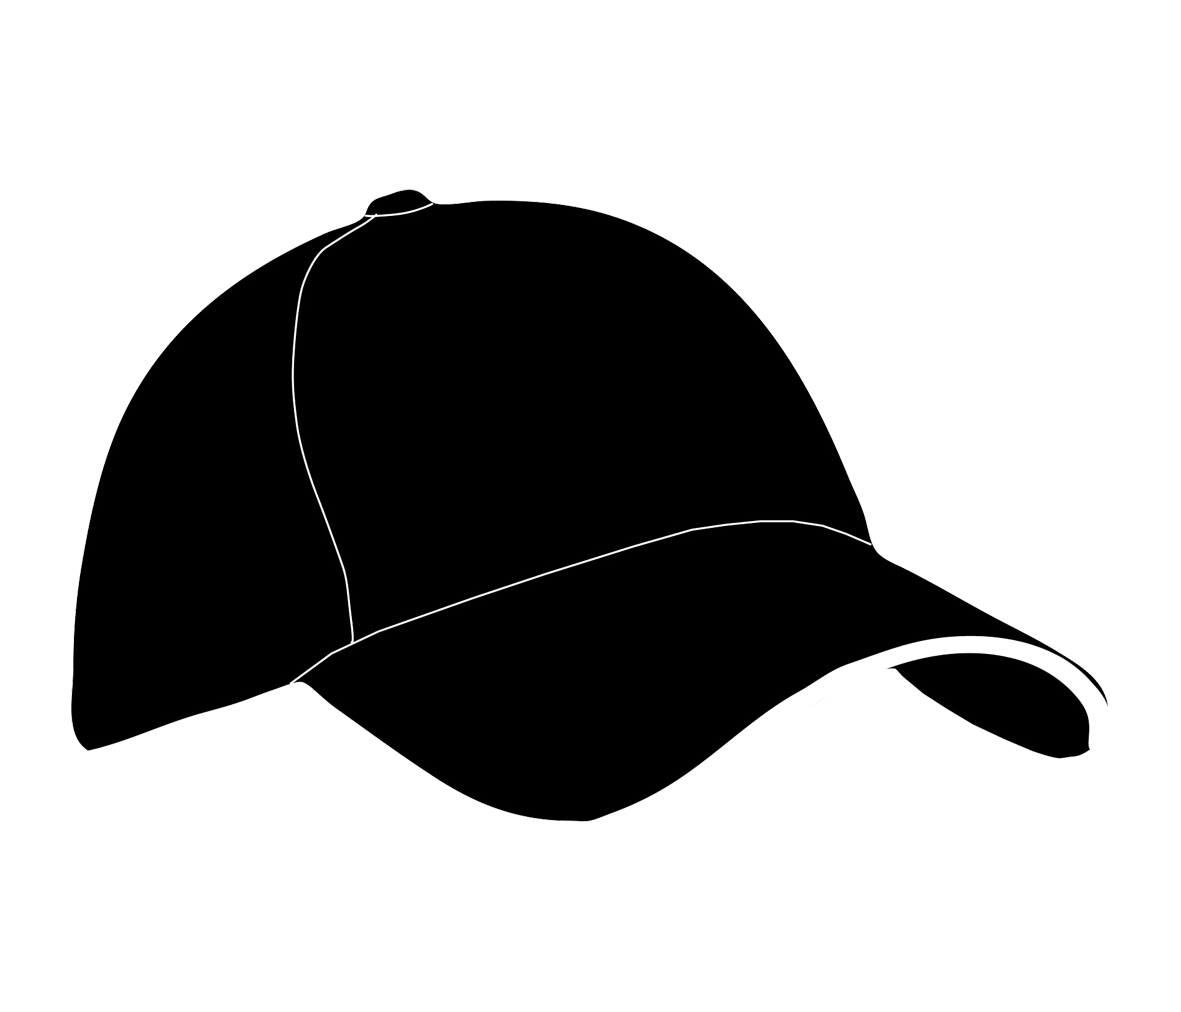 Baseball clipart black background Baseball colored icon baseball basball